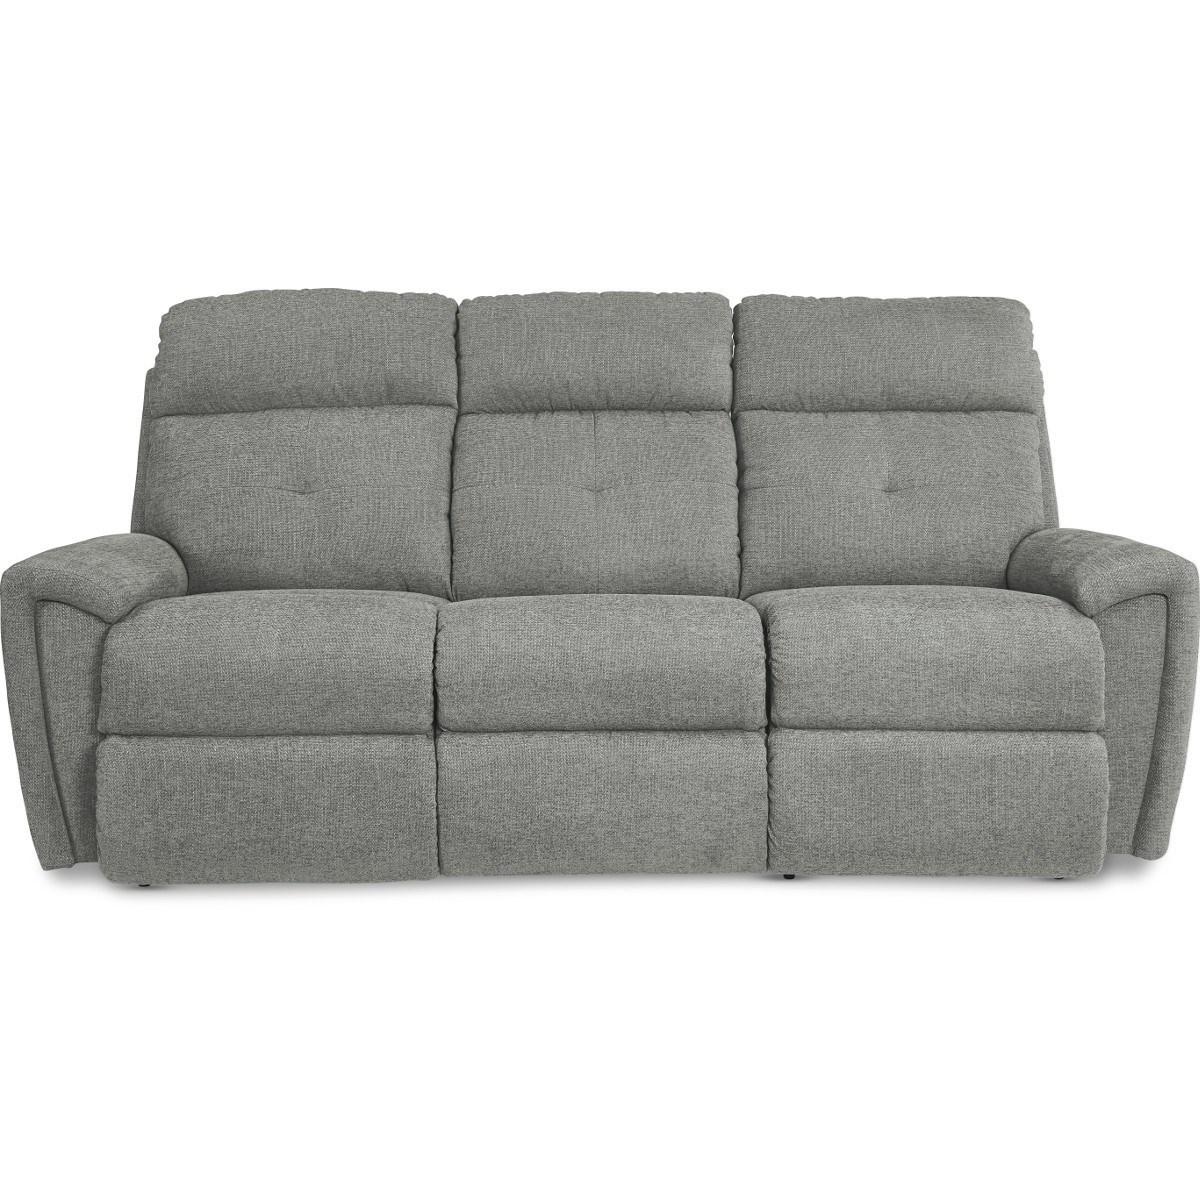 Douglas Reclining Sofa by La-Z-Boy at Bullard Furniture